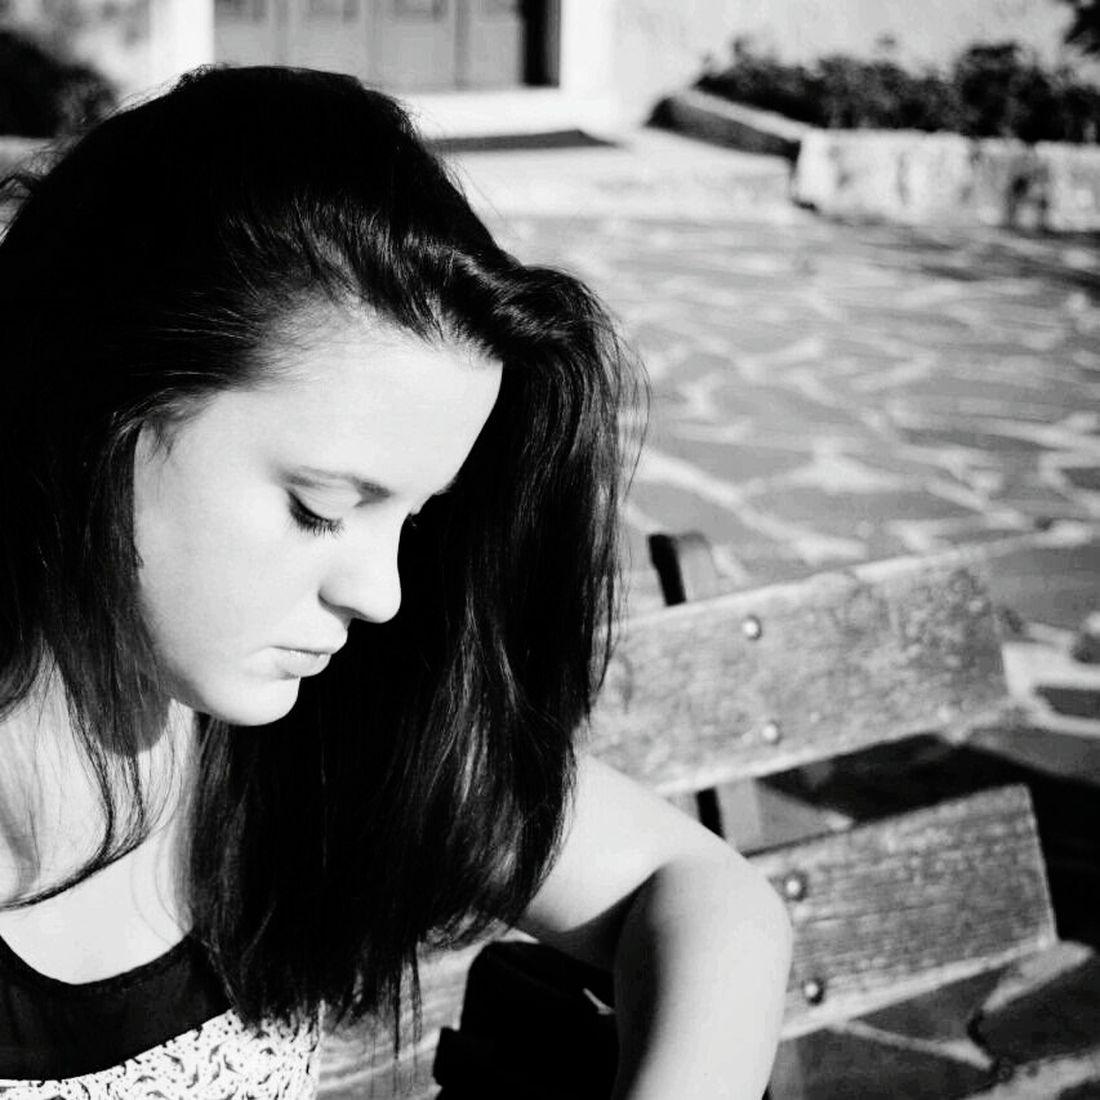 Eleonora Sanzeno San Zeno Di Montagna Panchina Italy Blackandwhite Black & White Black White Girls Italia Italian Italiangirl Donne Donna Ragazza Ragazzaitaliana Veneto Verona Verona Italy